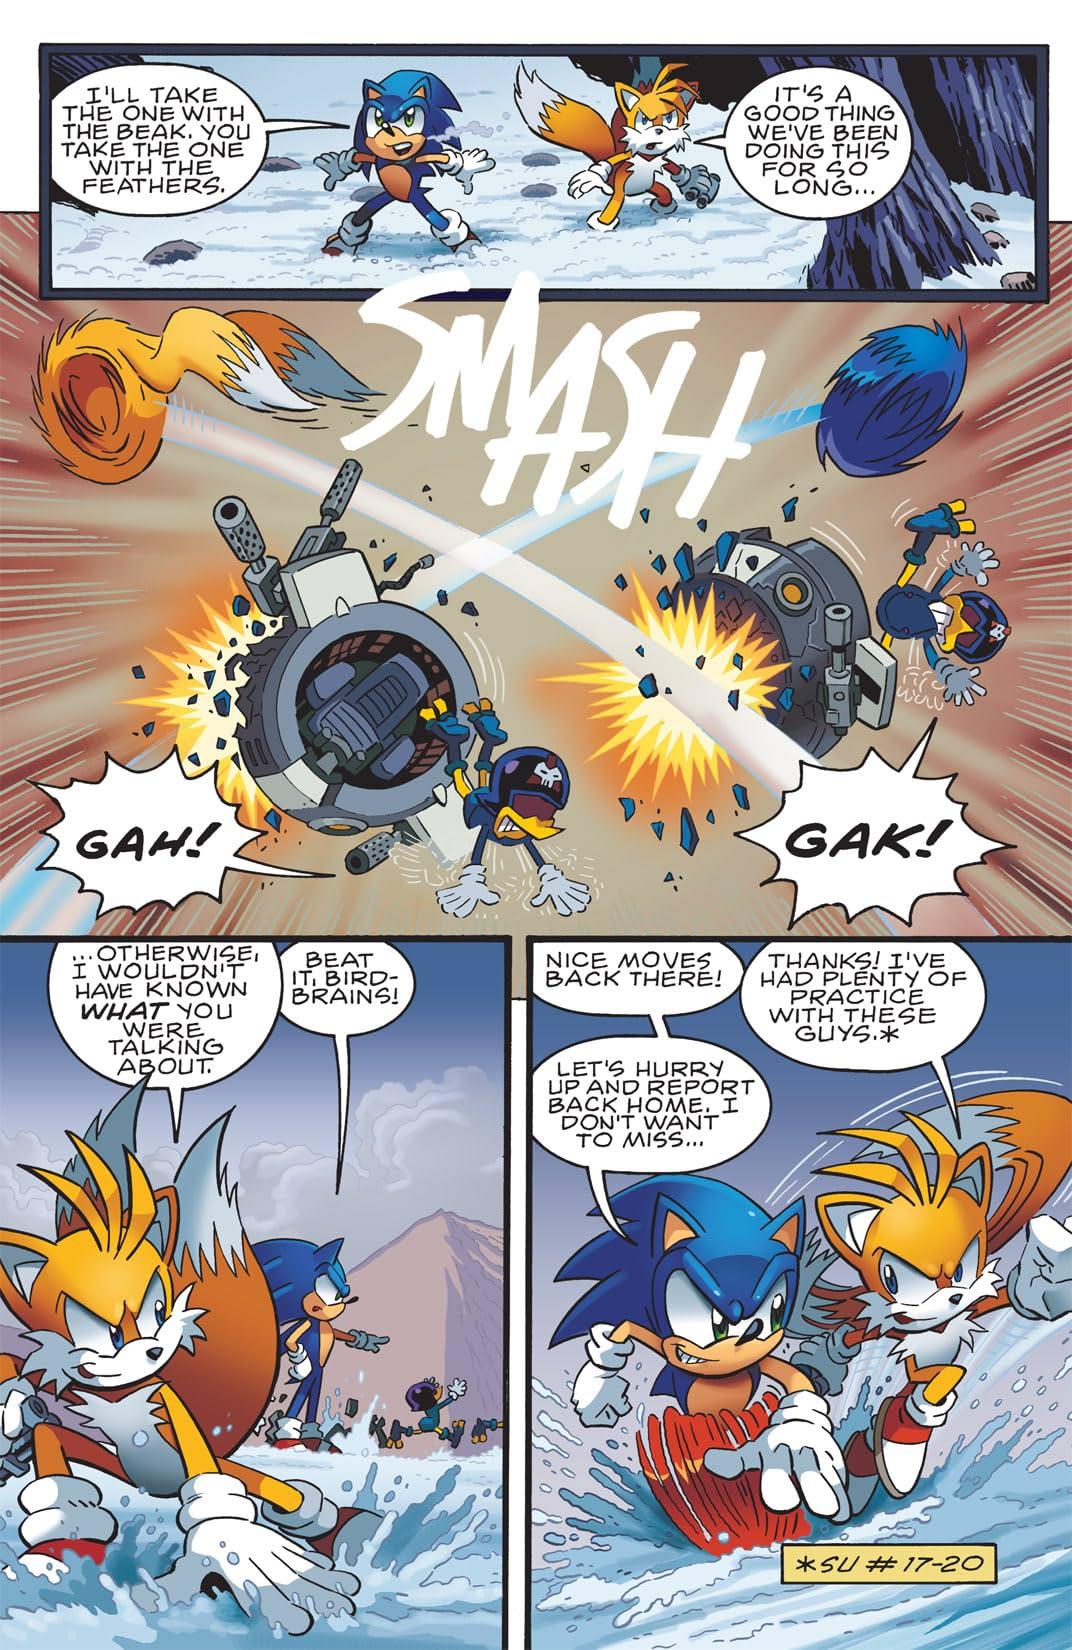 Sonic the Hedgehog #233